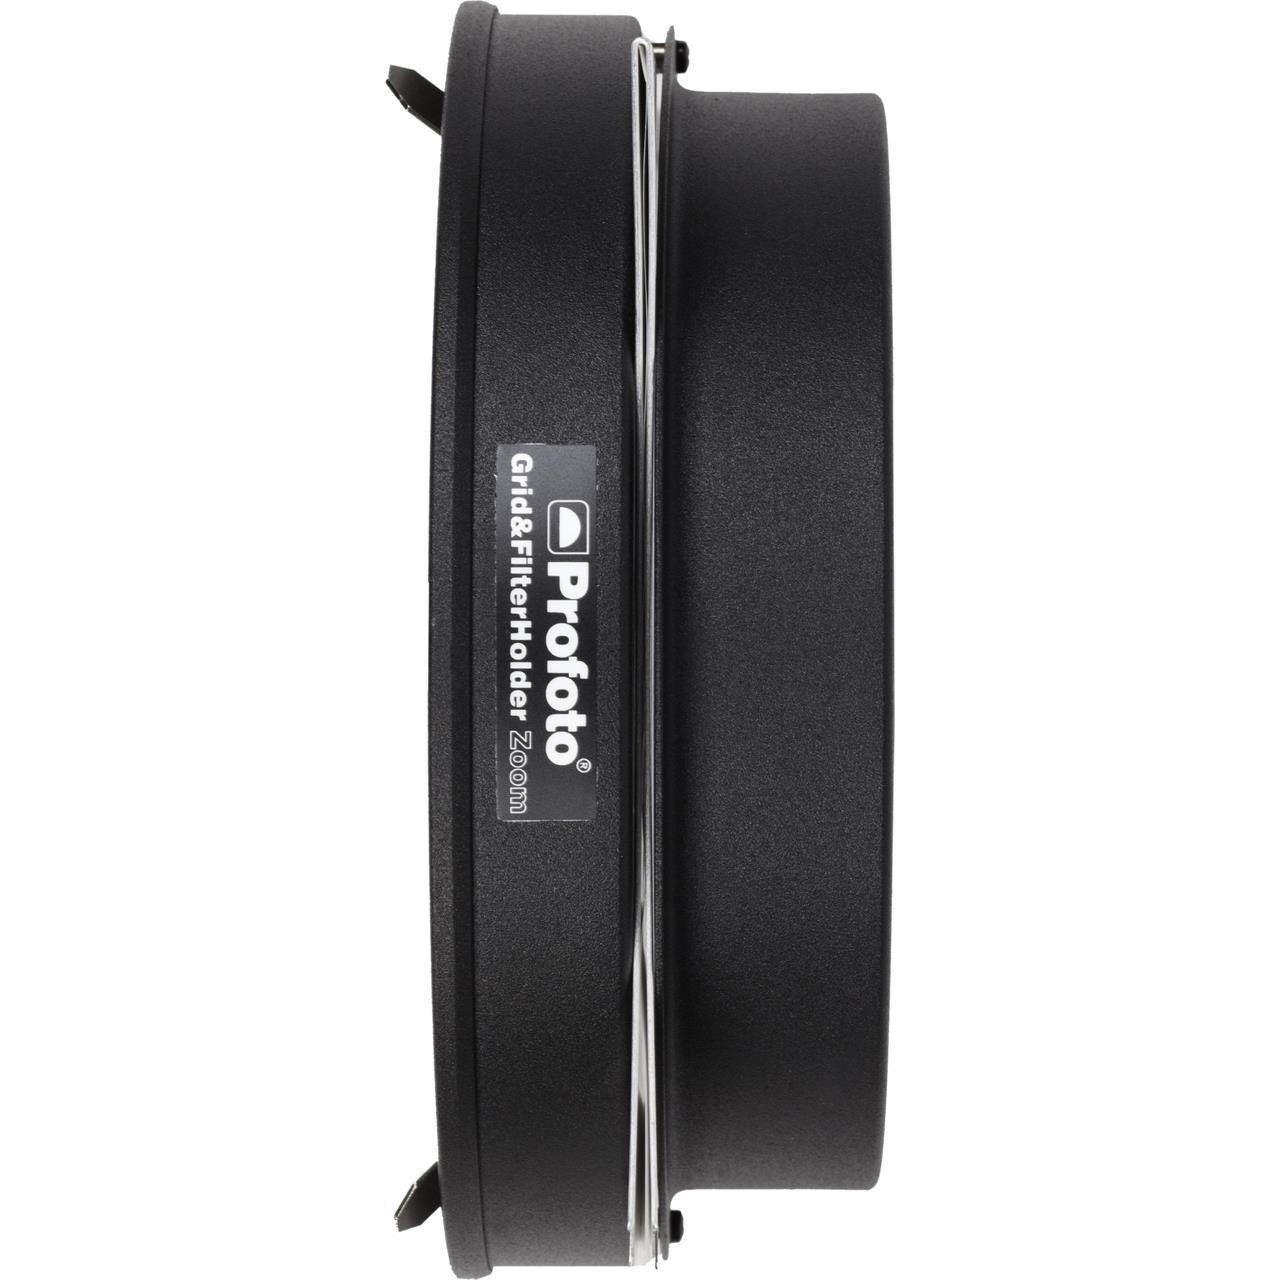 Profoto Off-Camera Flash II Grid and Gel Holder